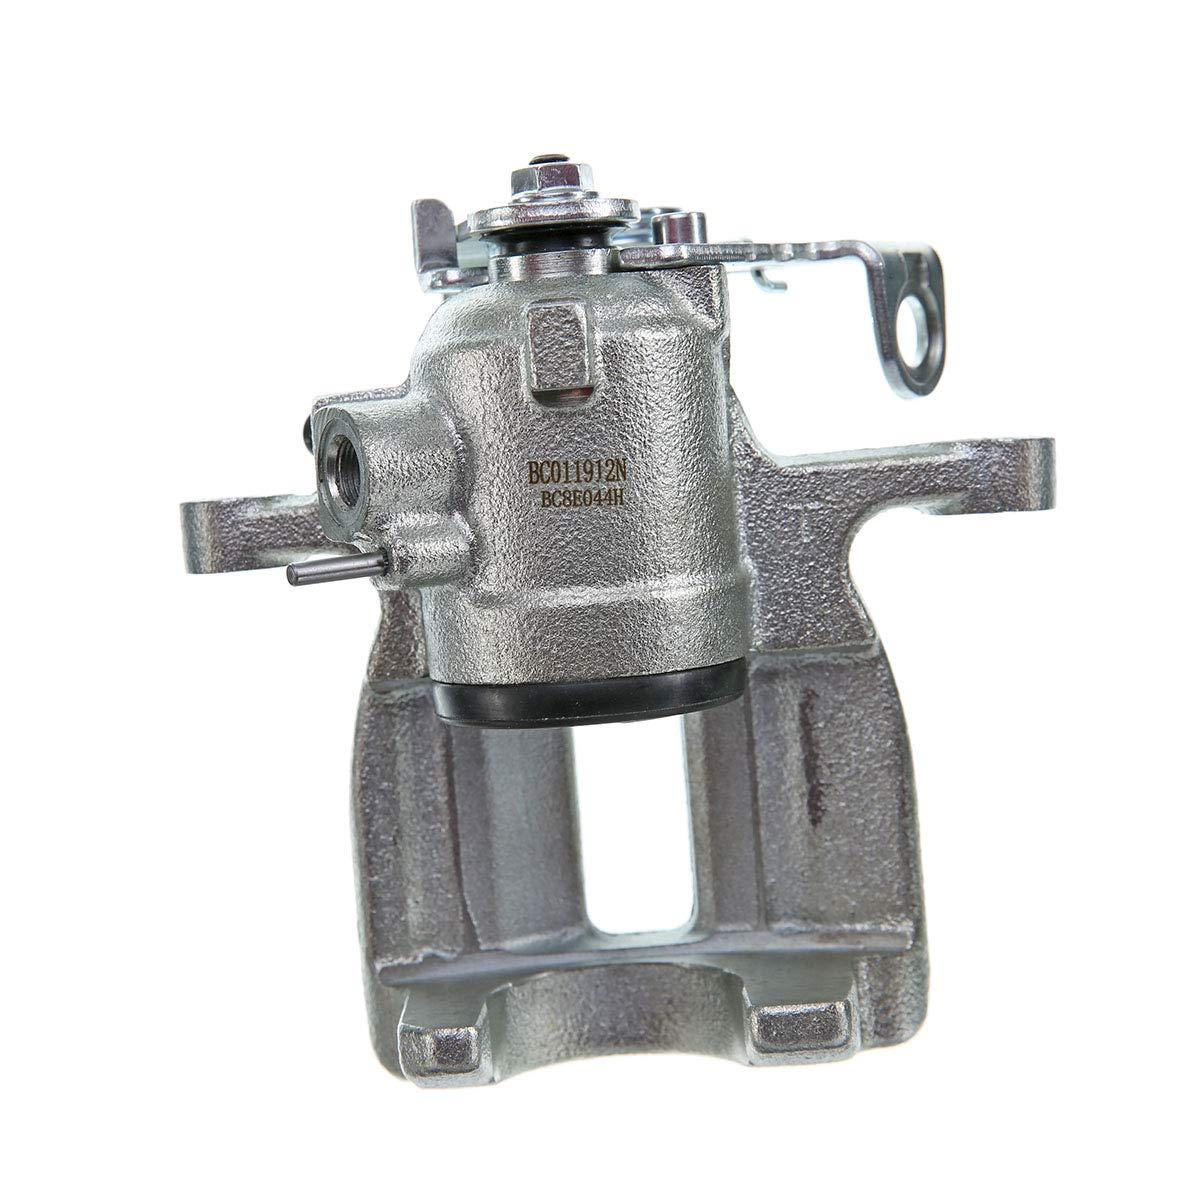 Brake Caliper Rear Right for A4 8E B6 B7 A4 Avant B6 B7 Exeo 3R 2000-2019 88E0615424D